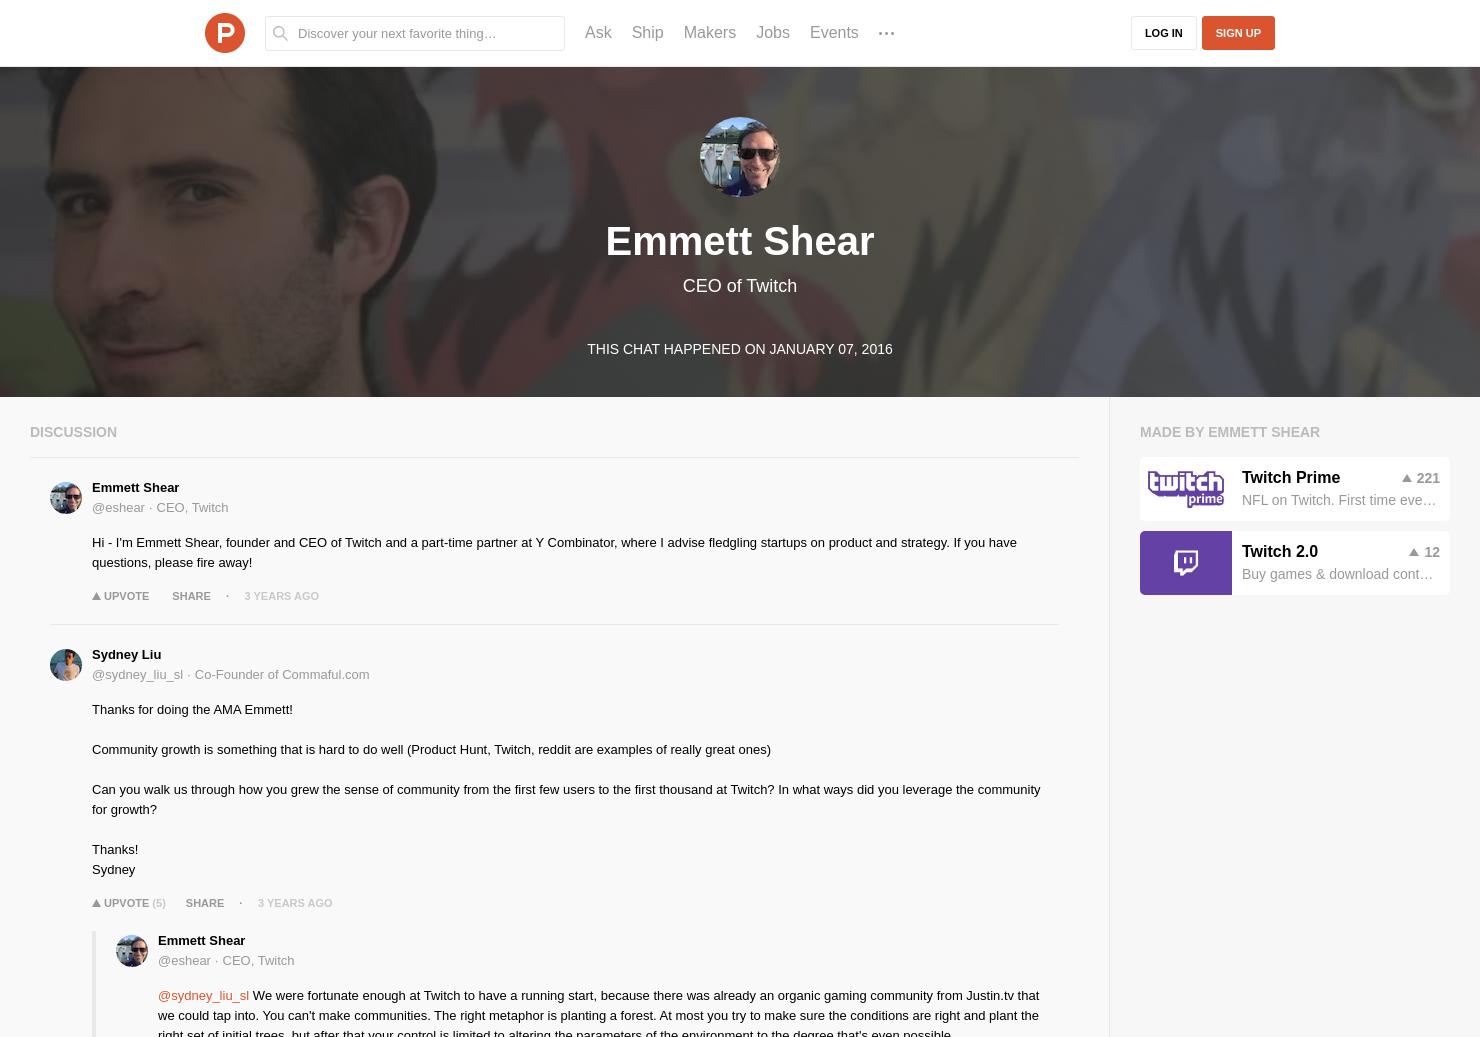 Emmett Shear LIVE Chat on Product Hunt